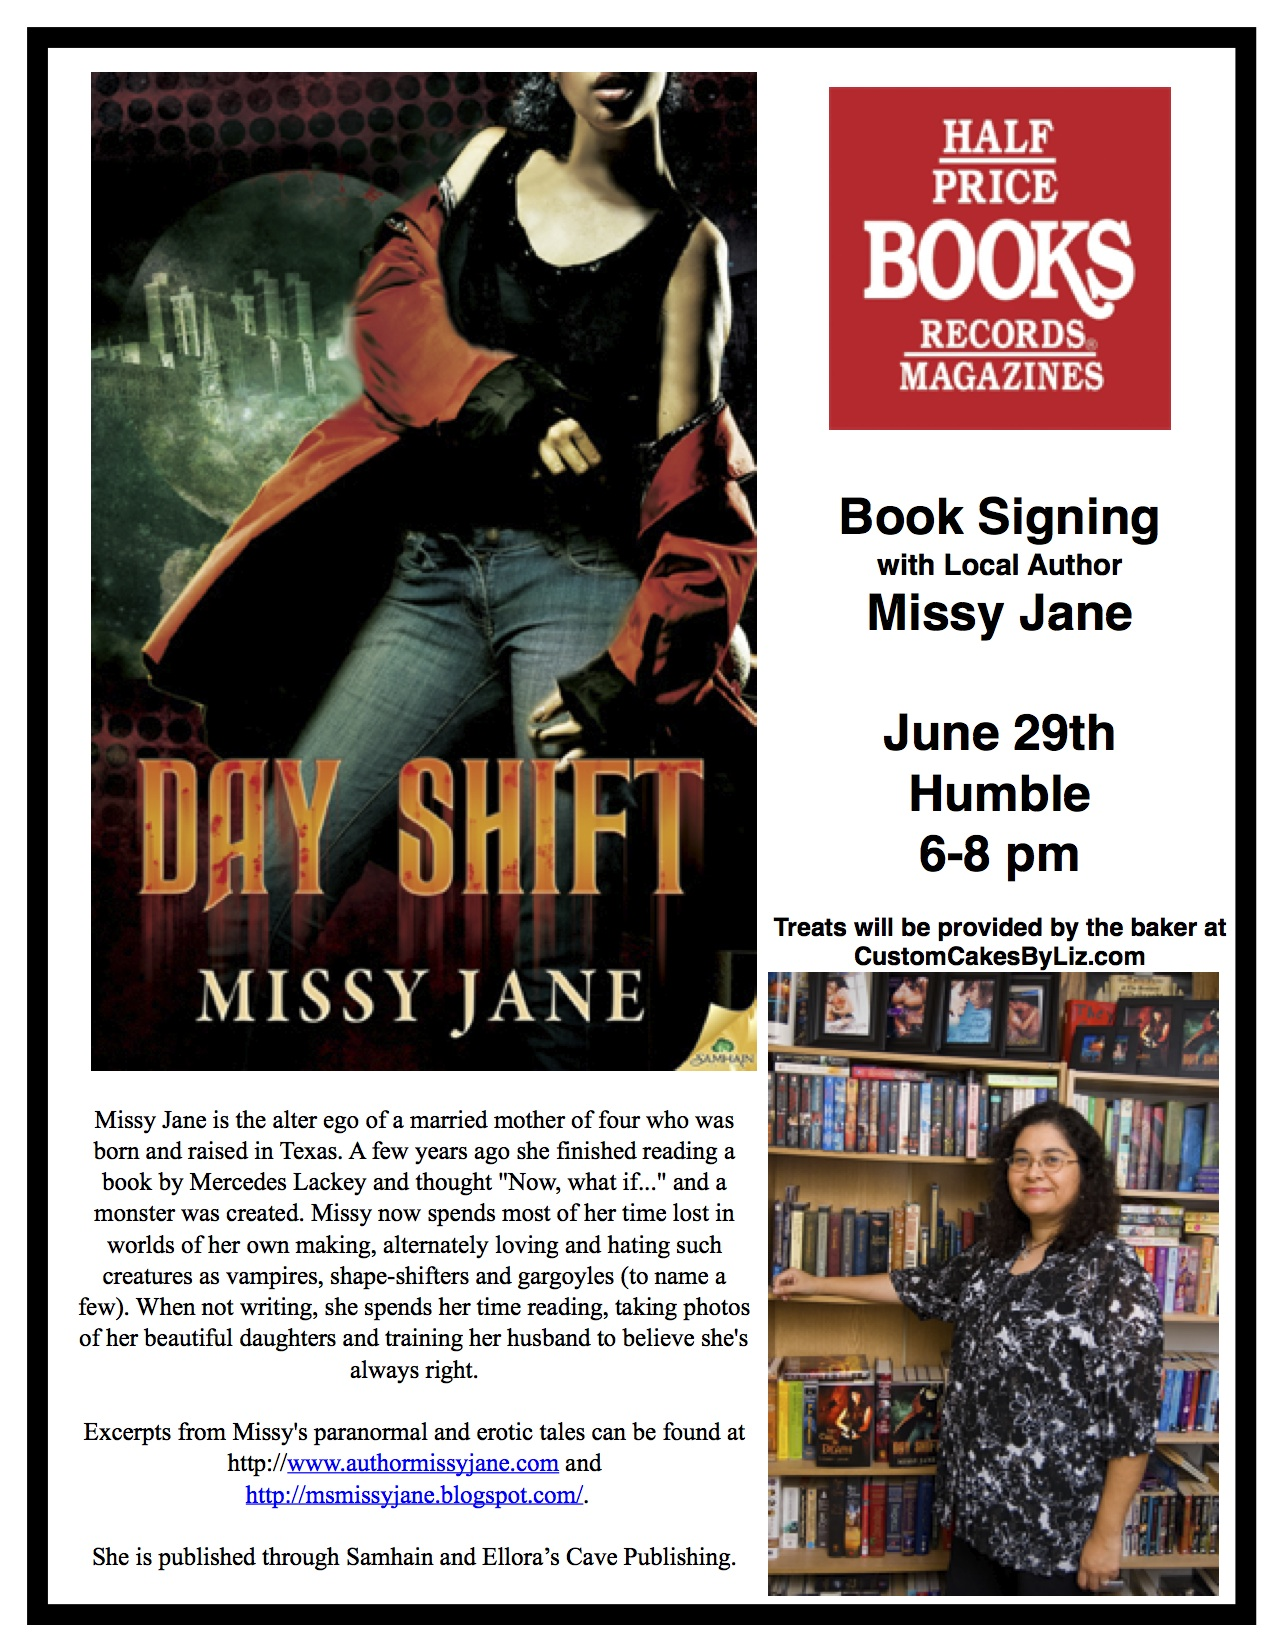 Missy Jane Humble